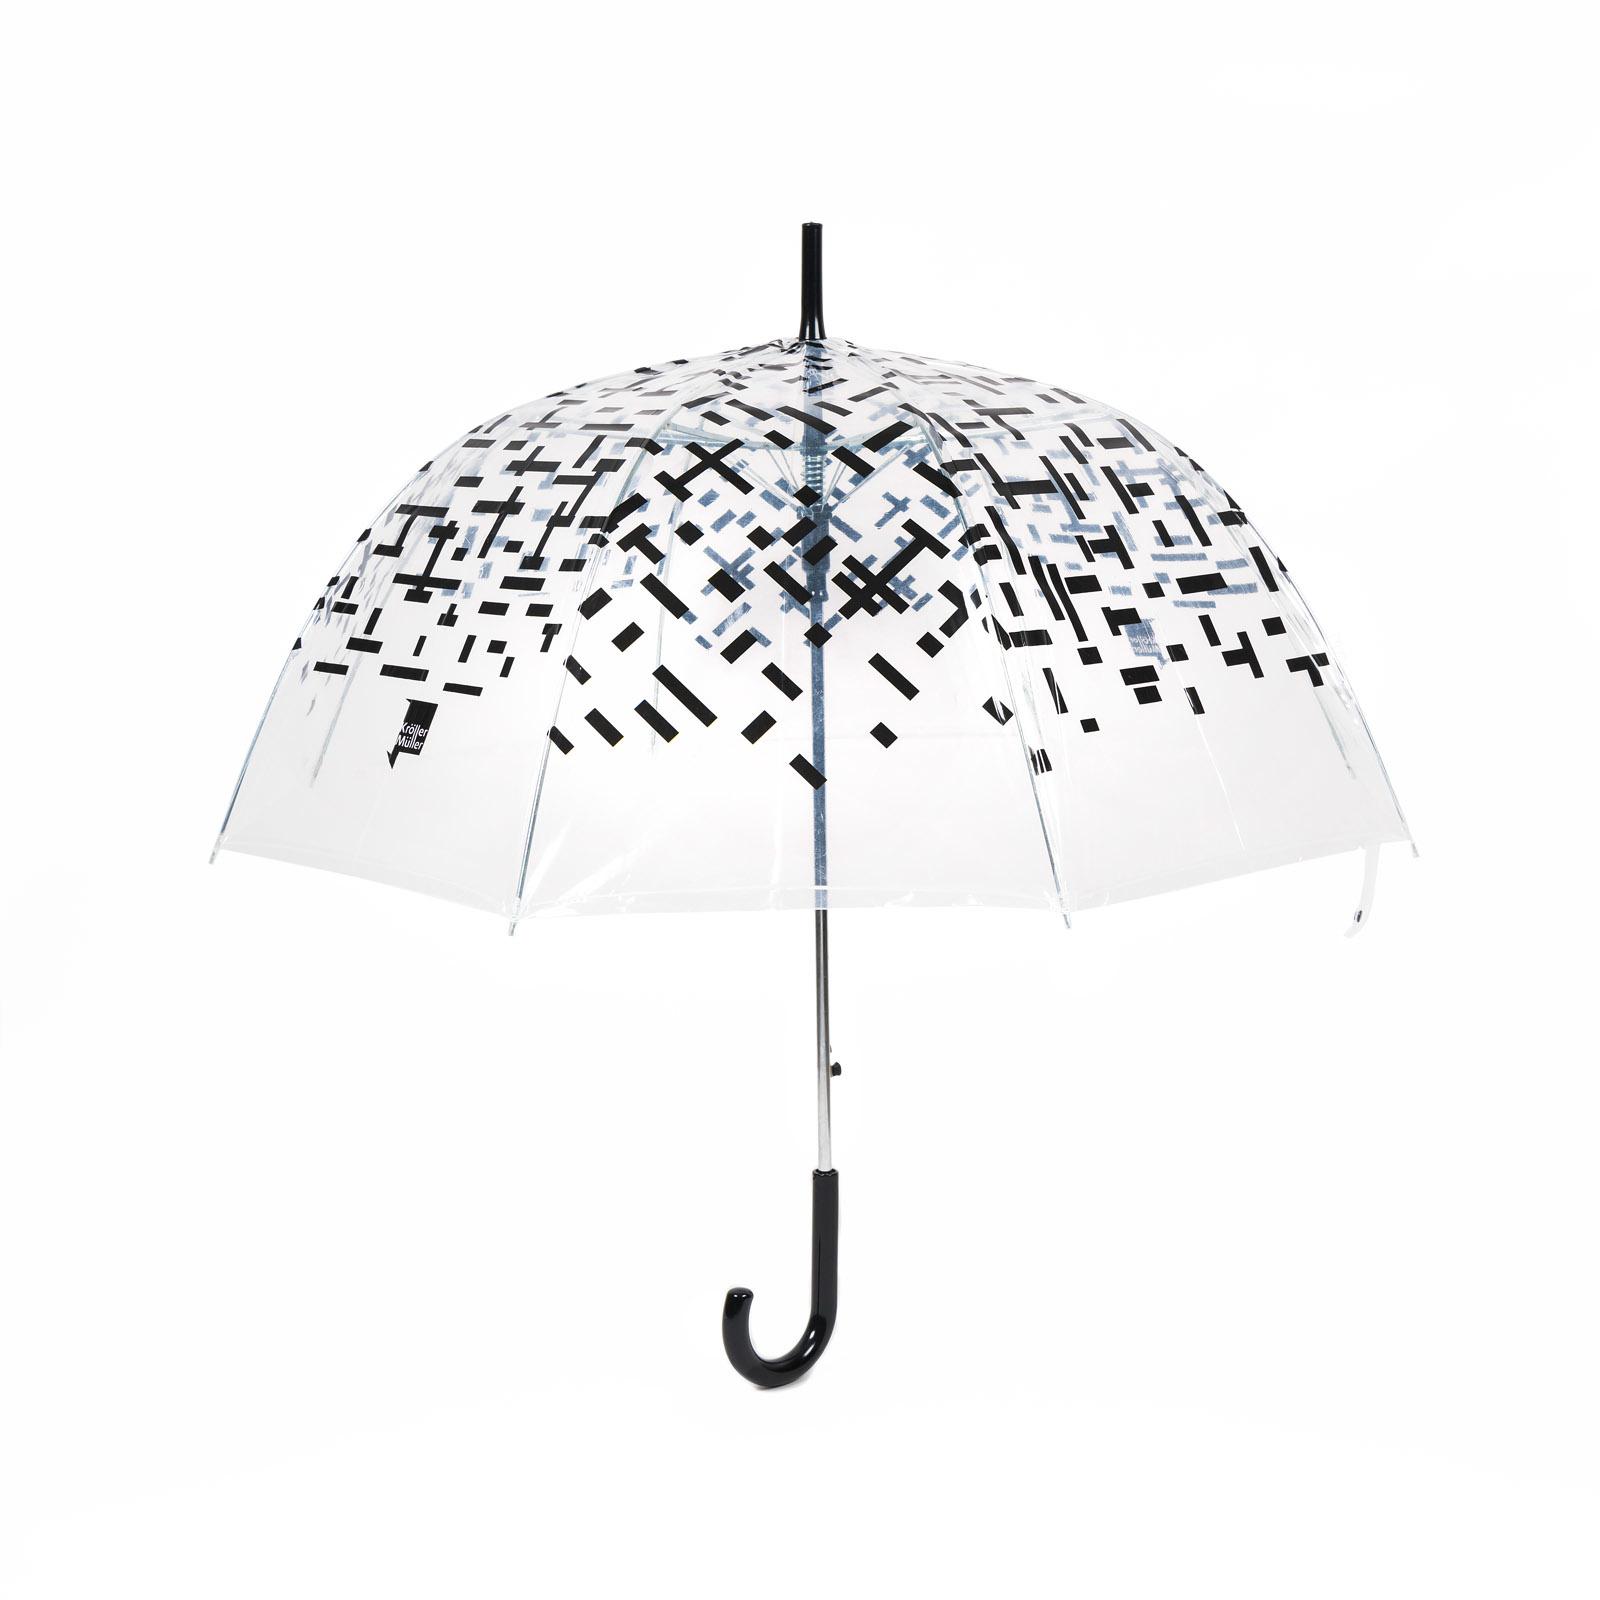 Umbrella - Piet Mondriaan